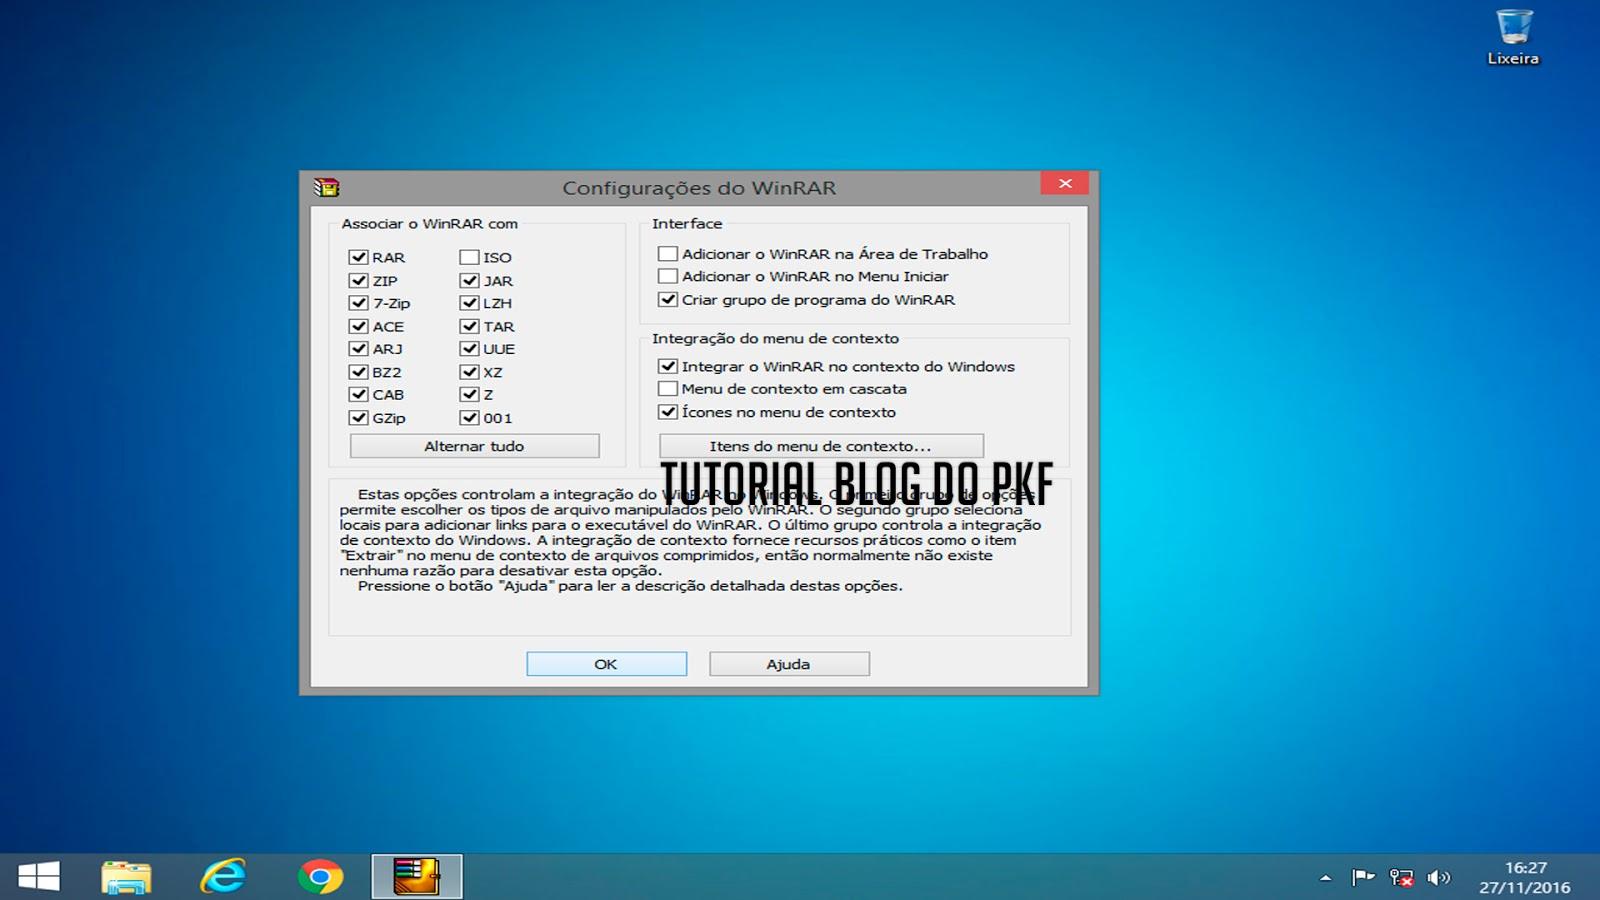 rar file download for pc 64 bit